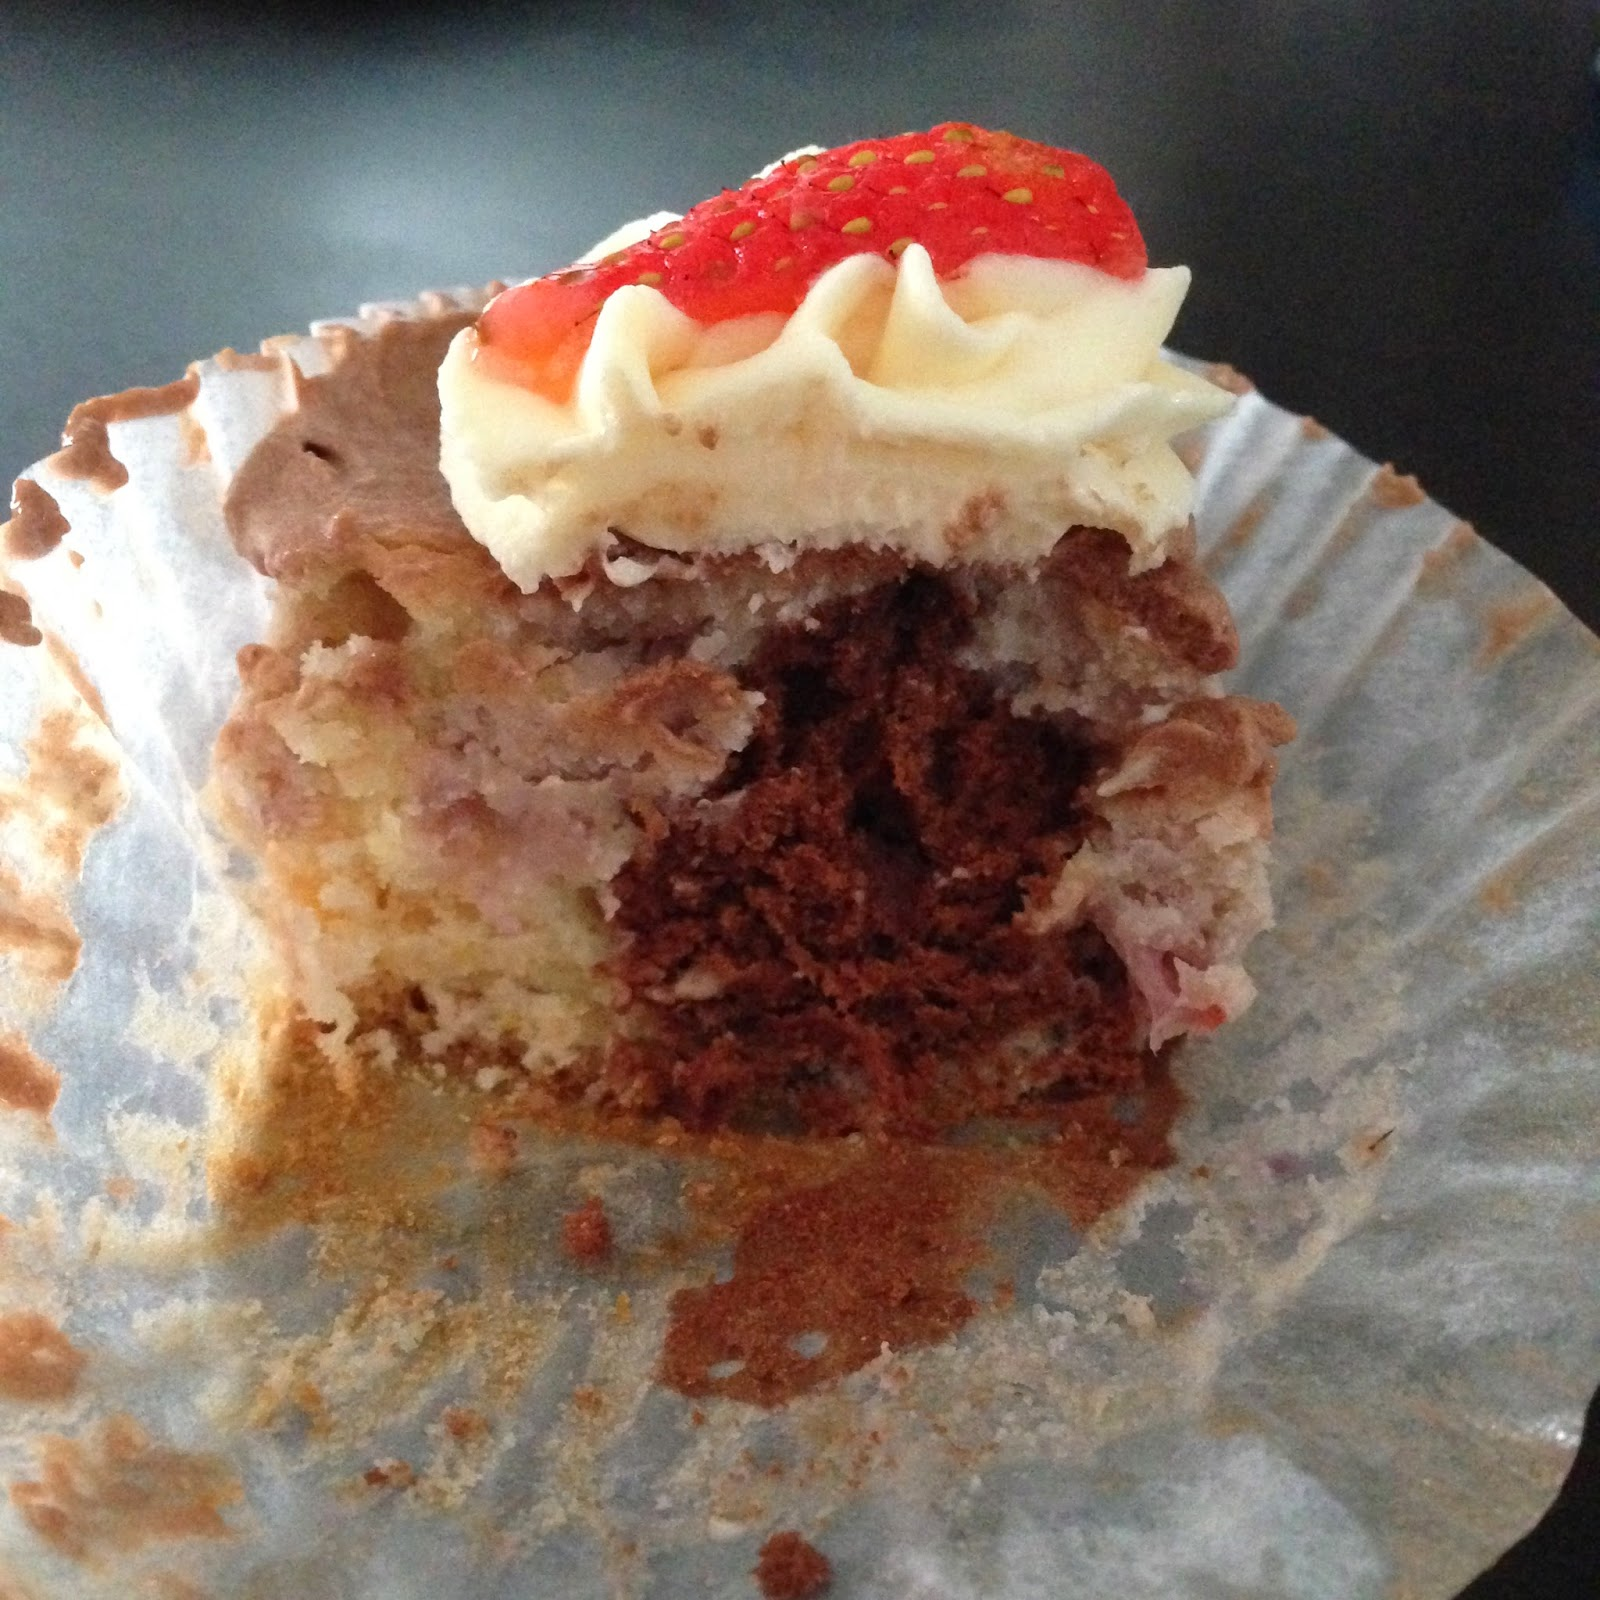 The inside of neapolitan cupcake by SheaSonia